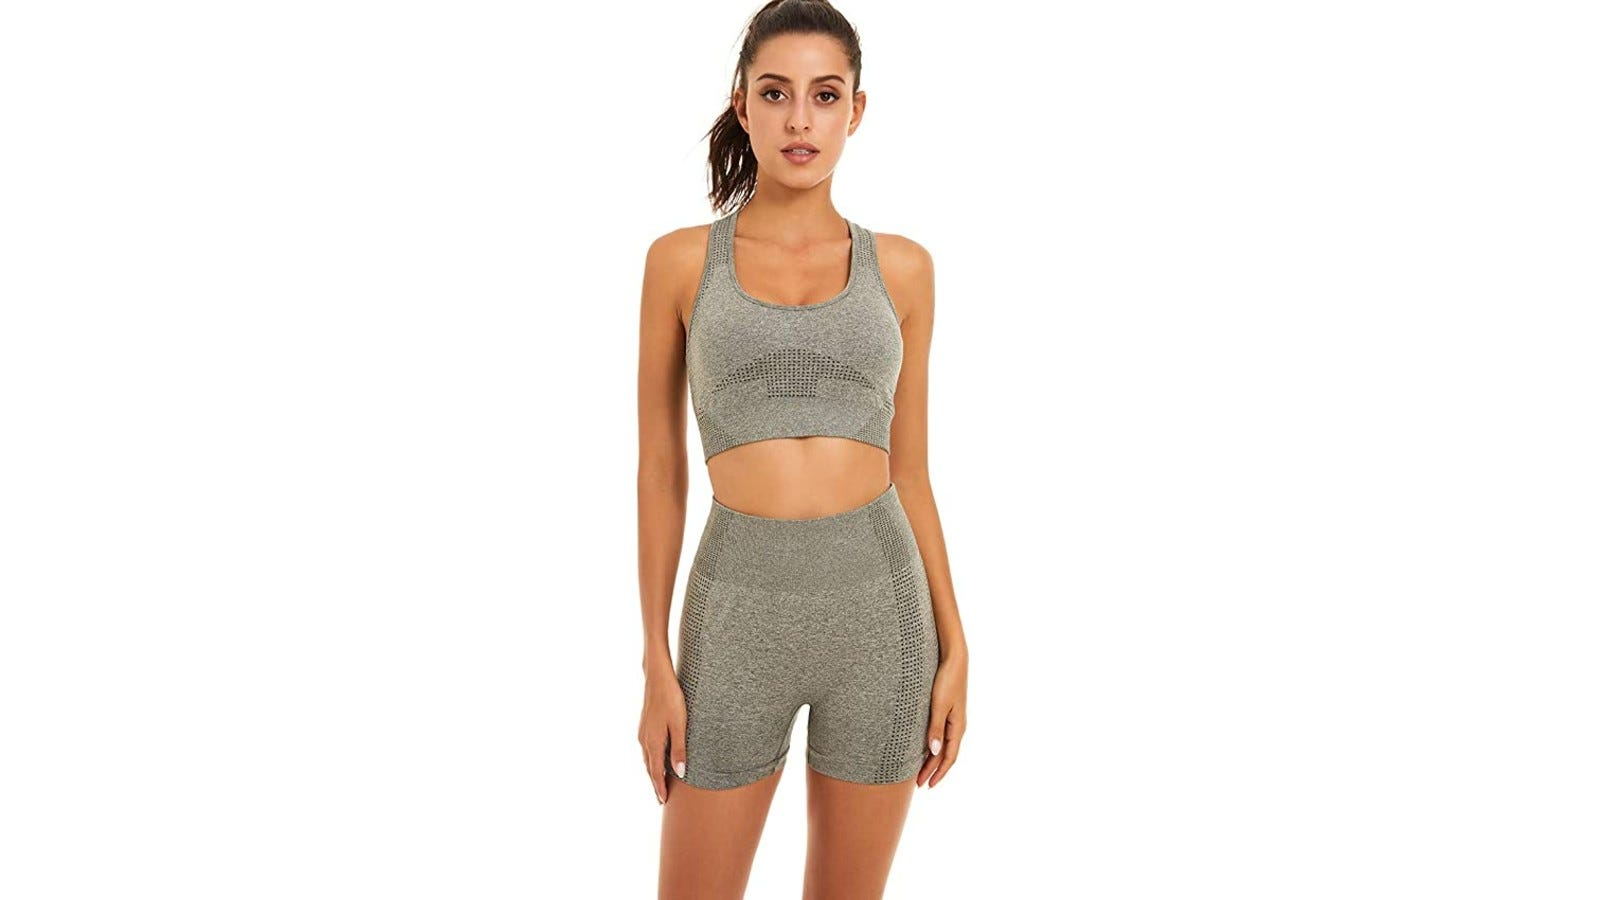 woman wearing gray activewear short set